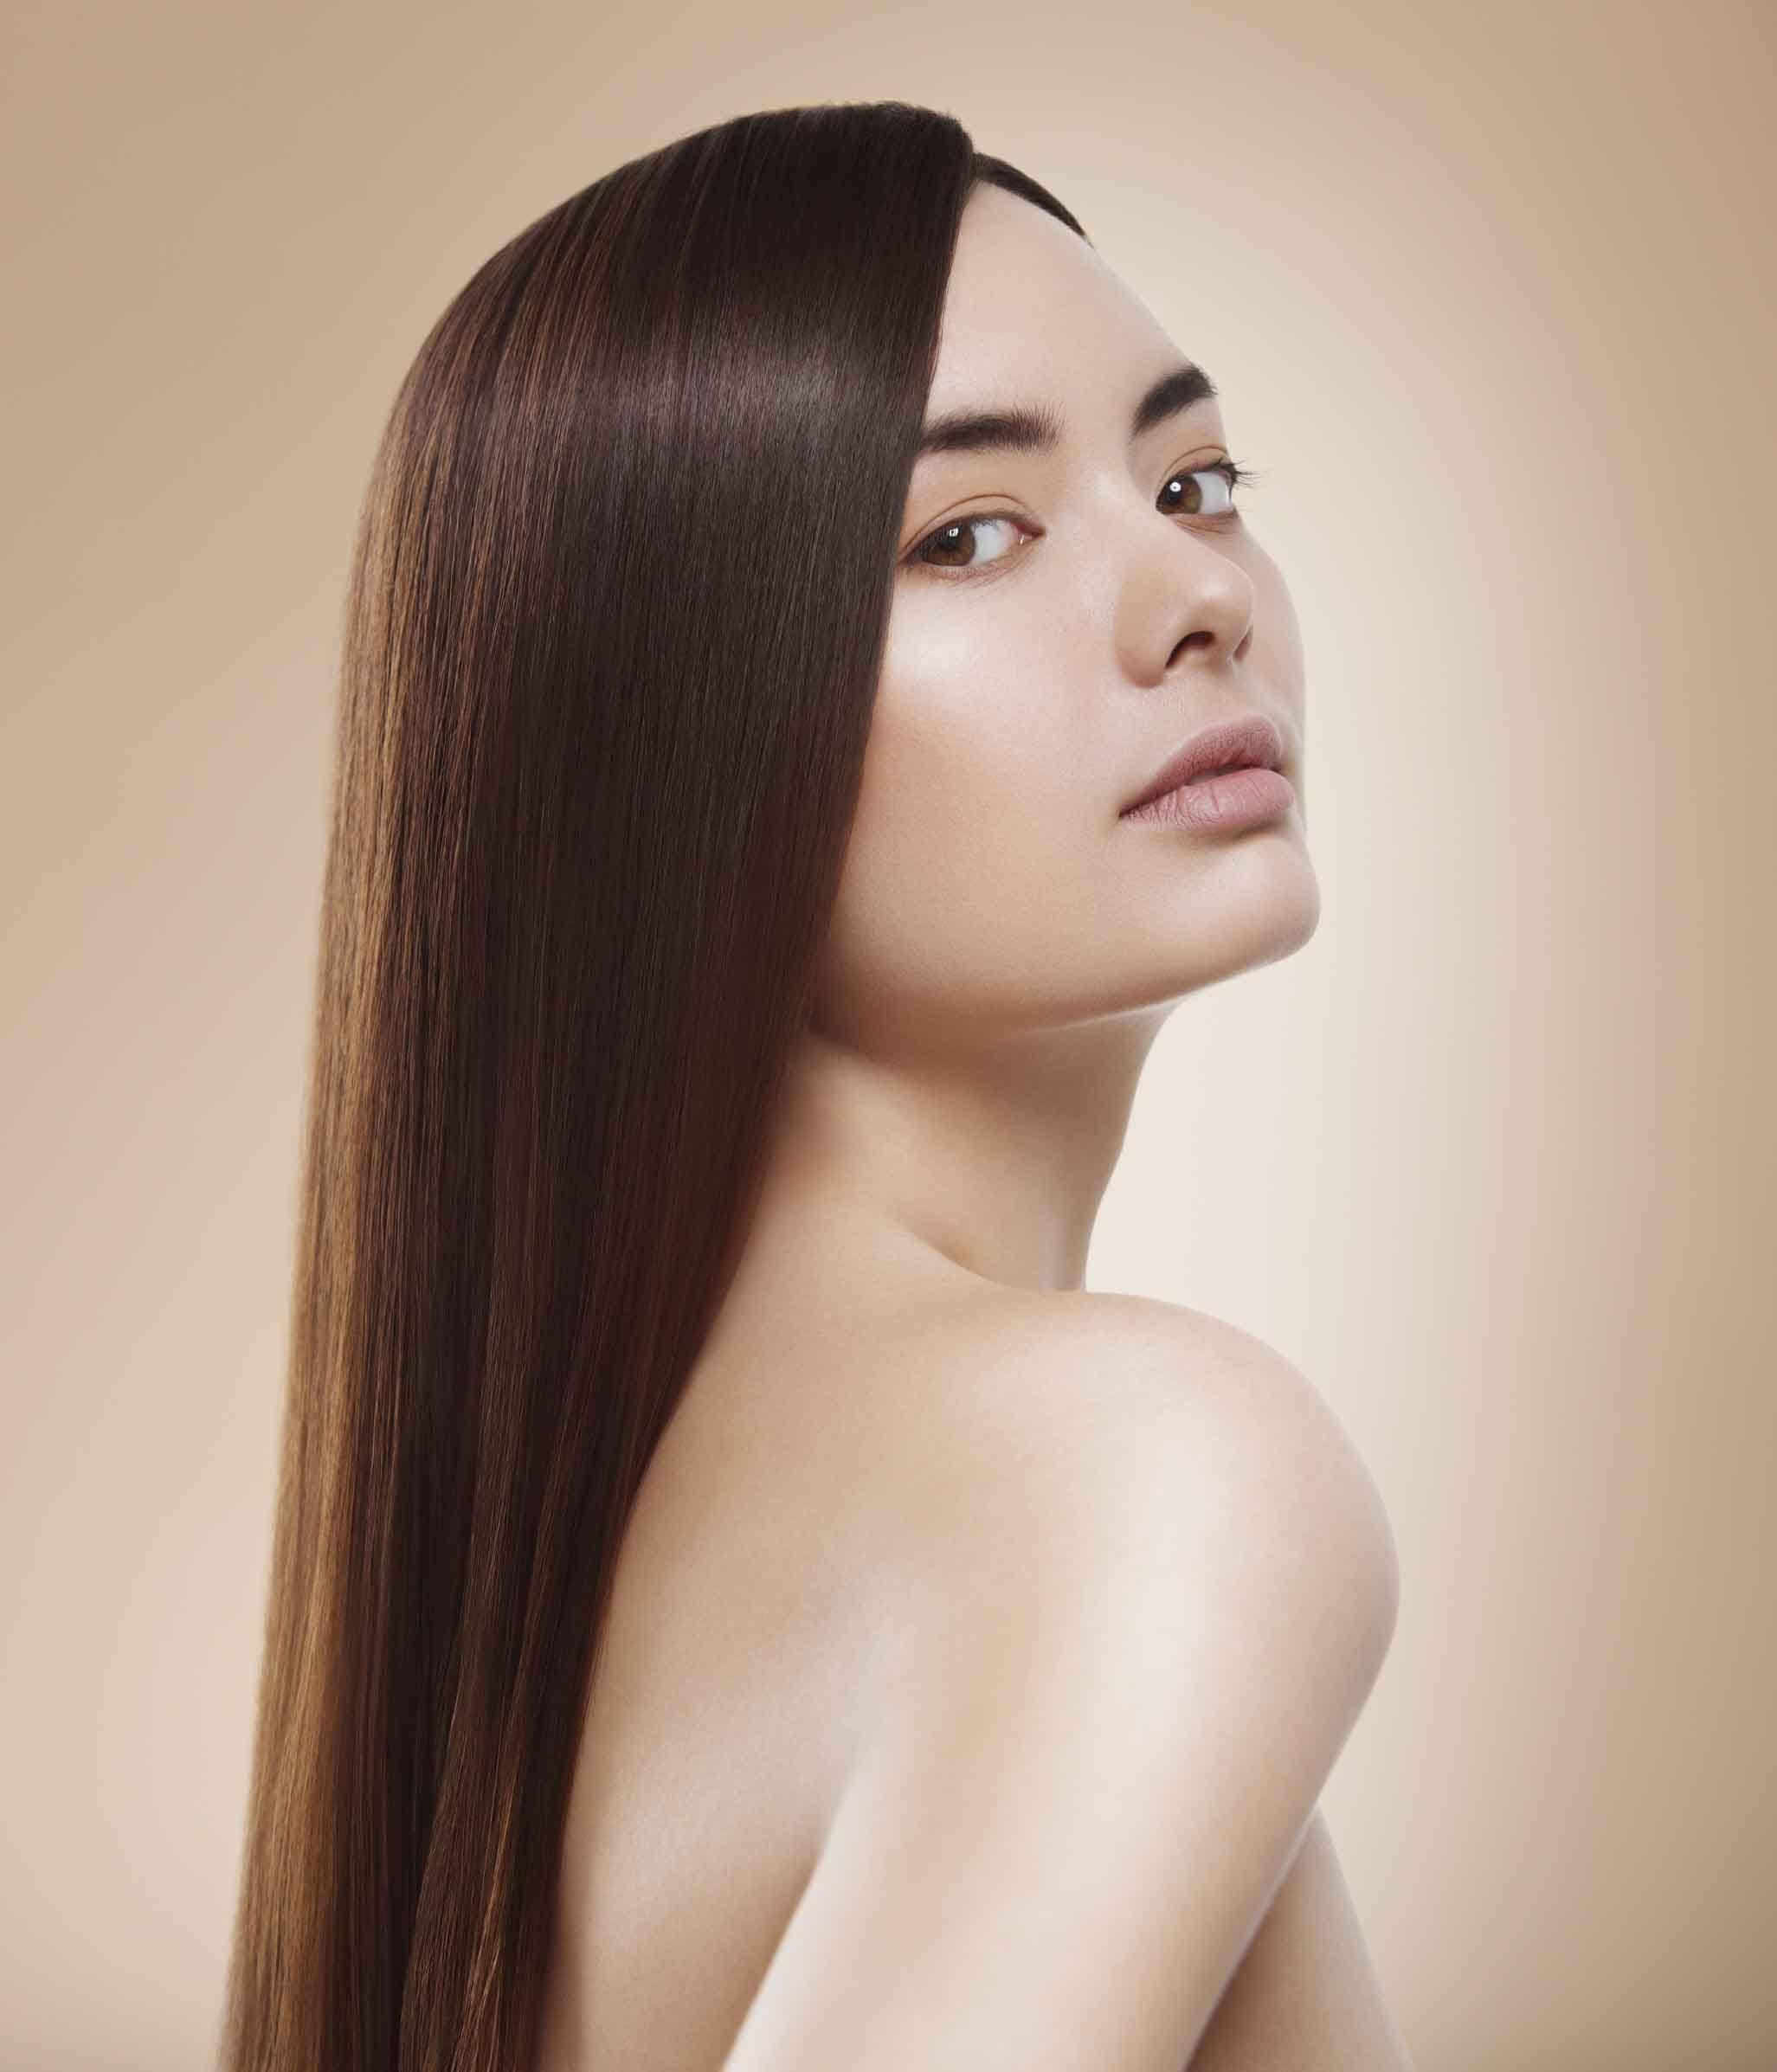 sulfate-free shampoo: how it works